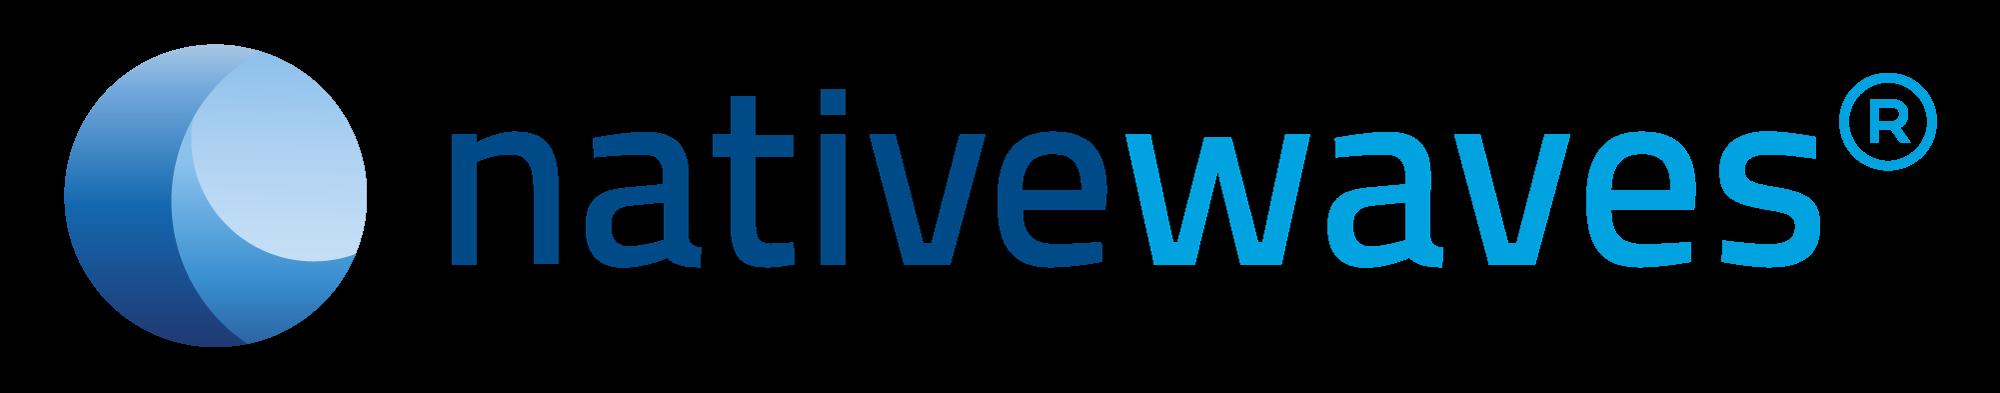 NativeWaves logo